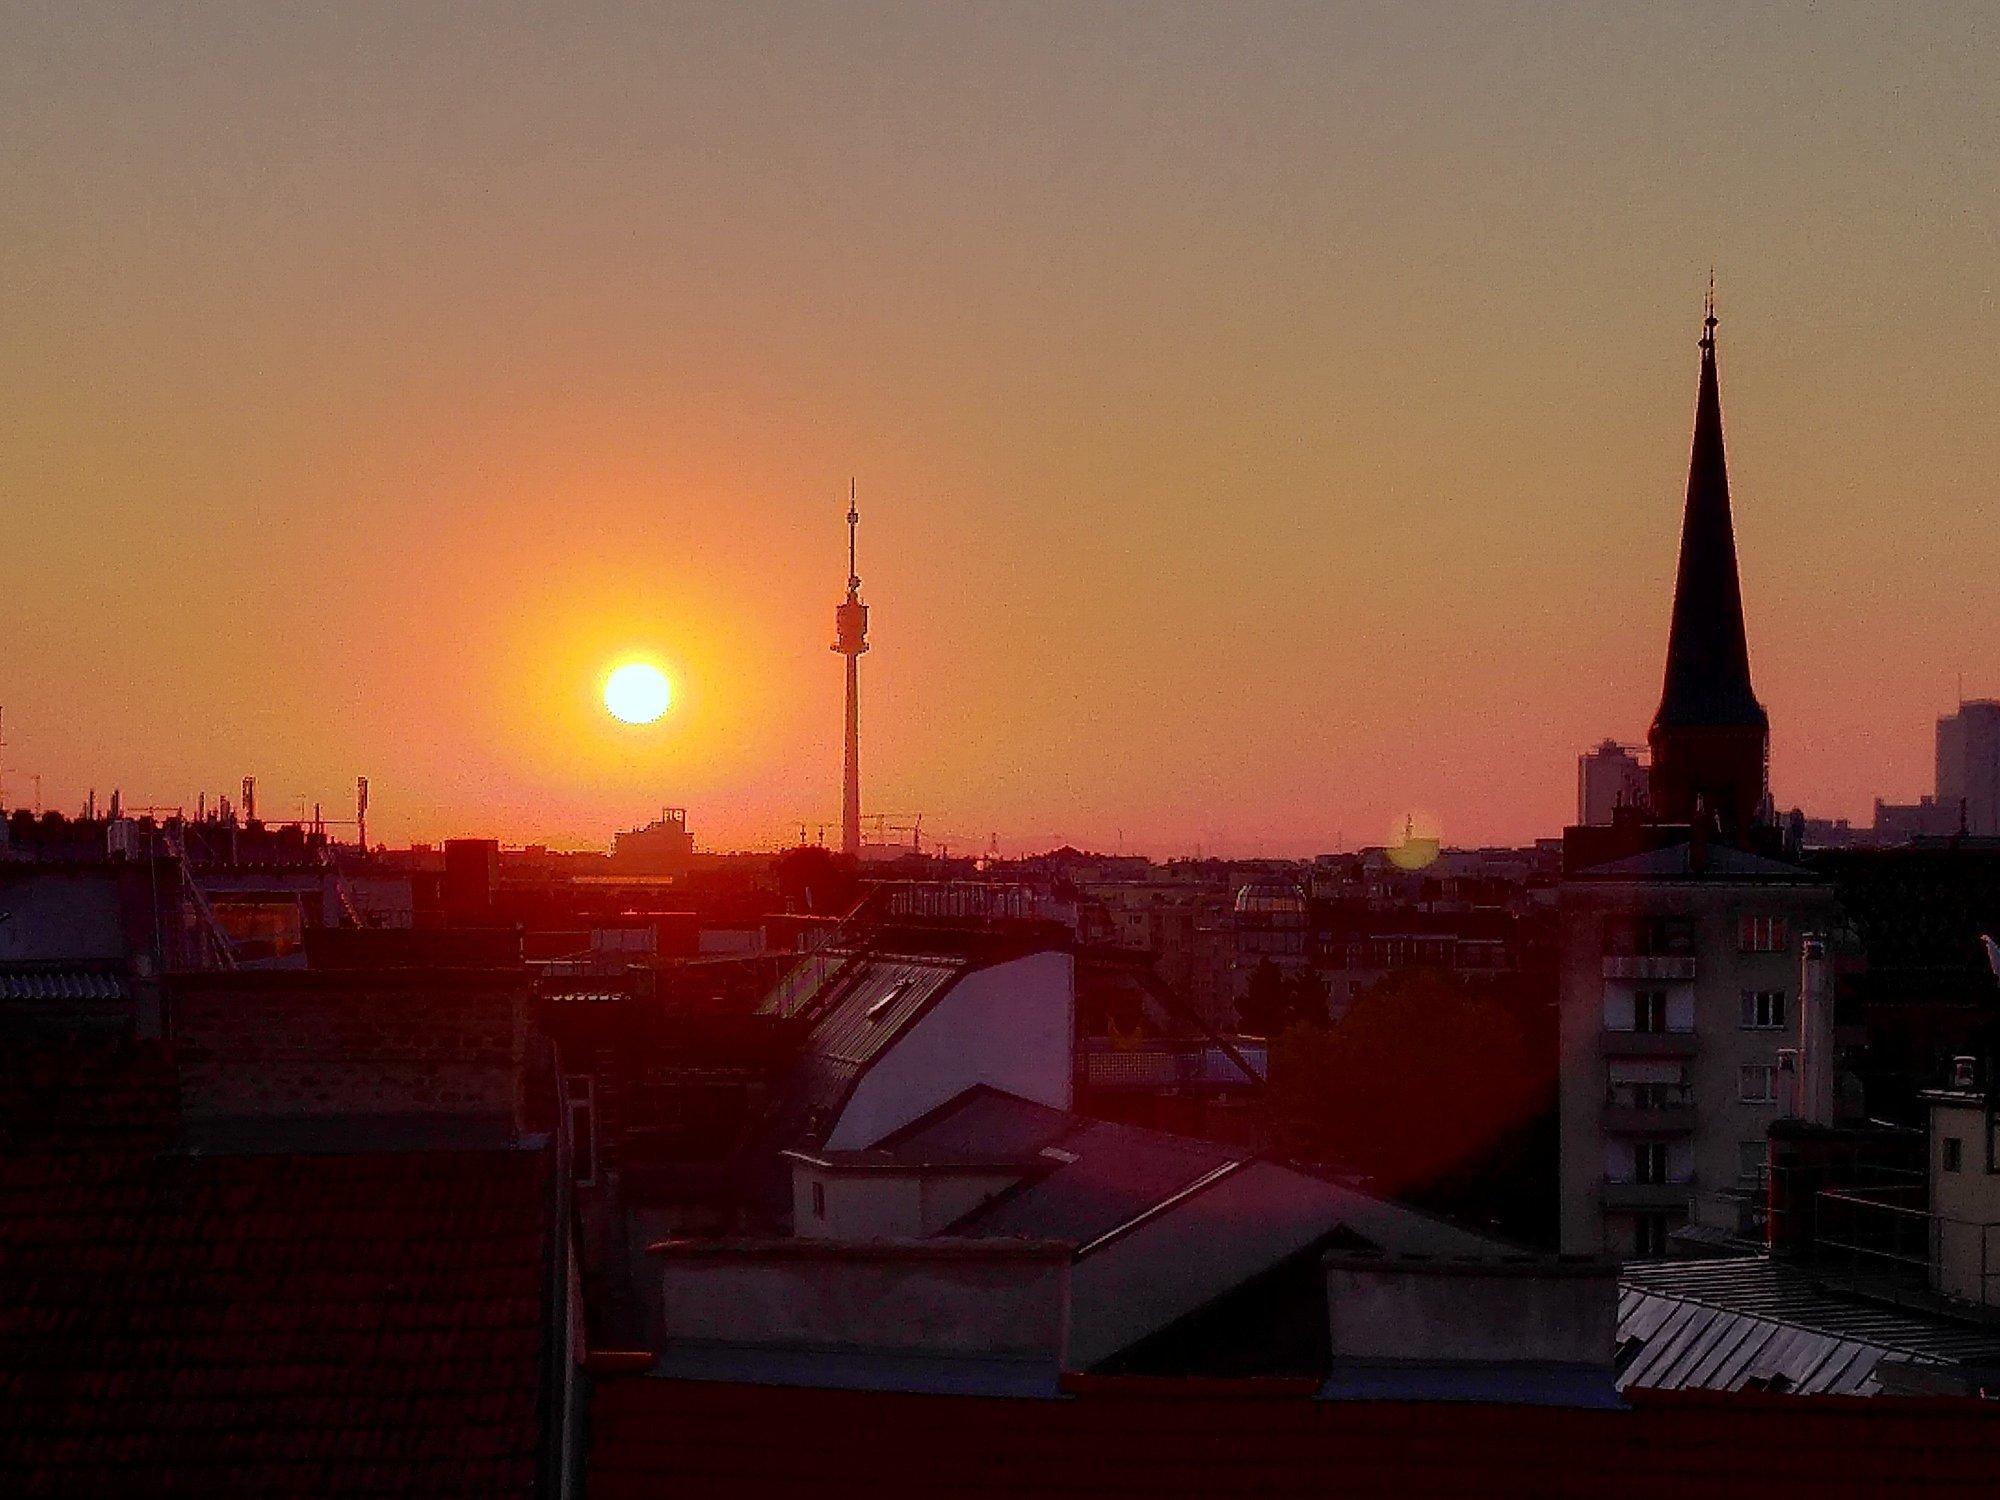 Sunrise over vienna